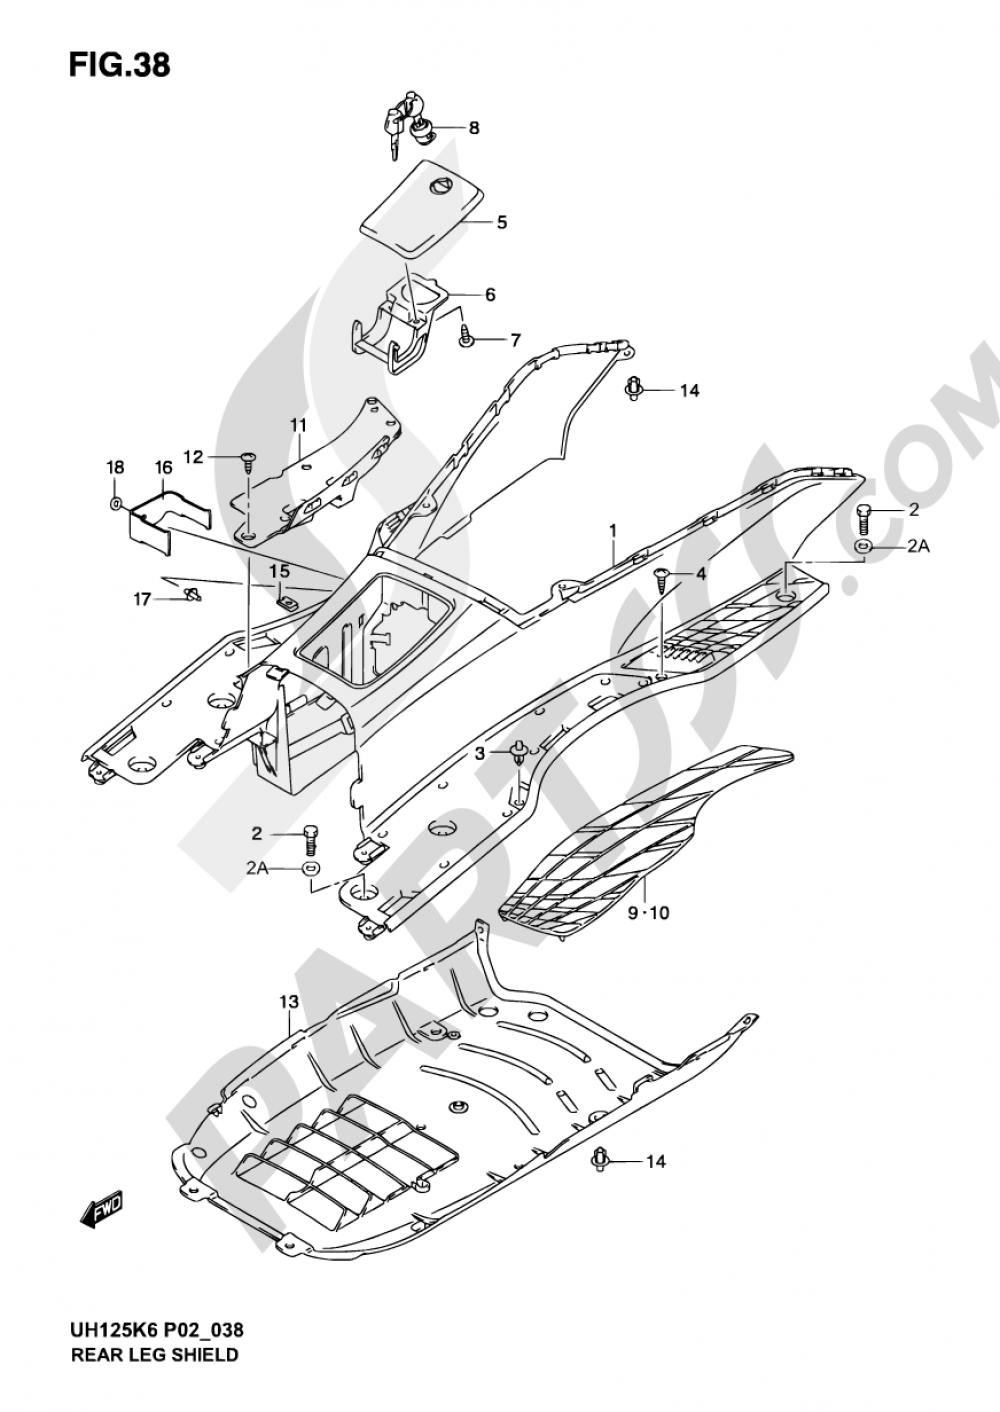 38 - REAR LEG SHIELD Suzuki BURGMAN UH125 2002